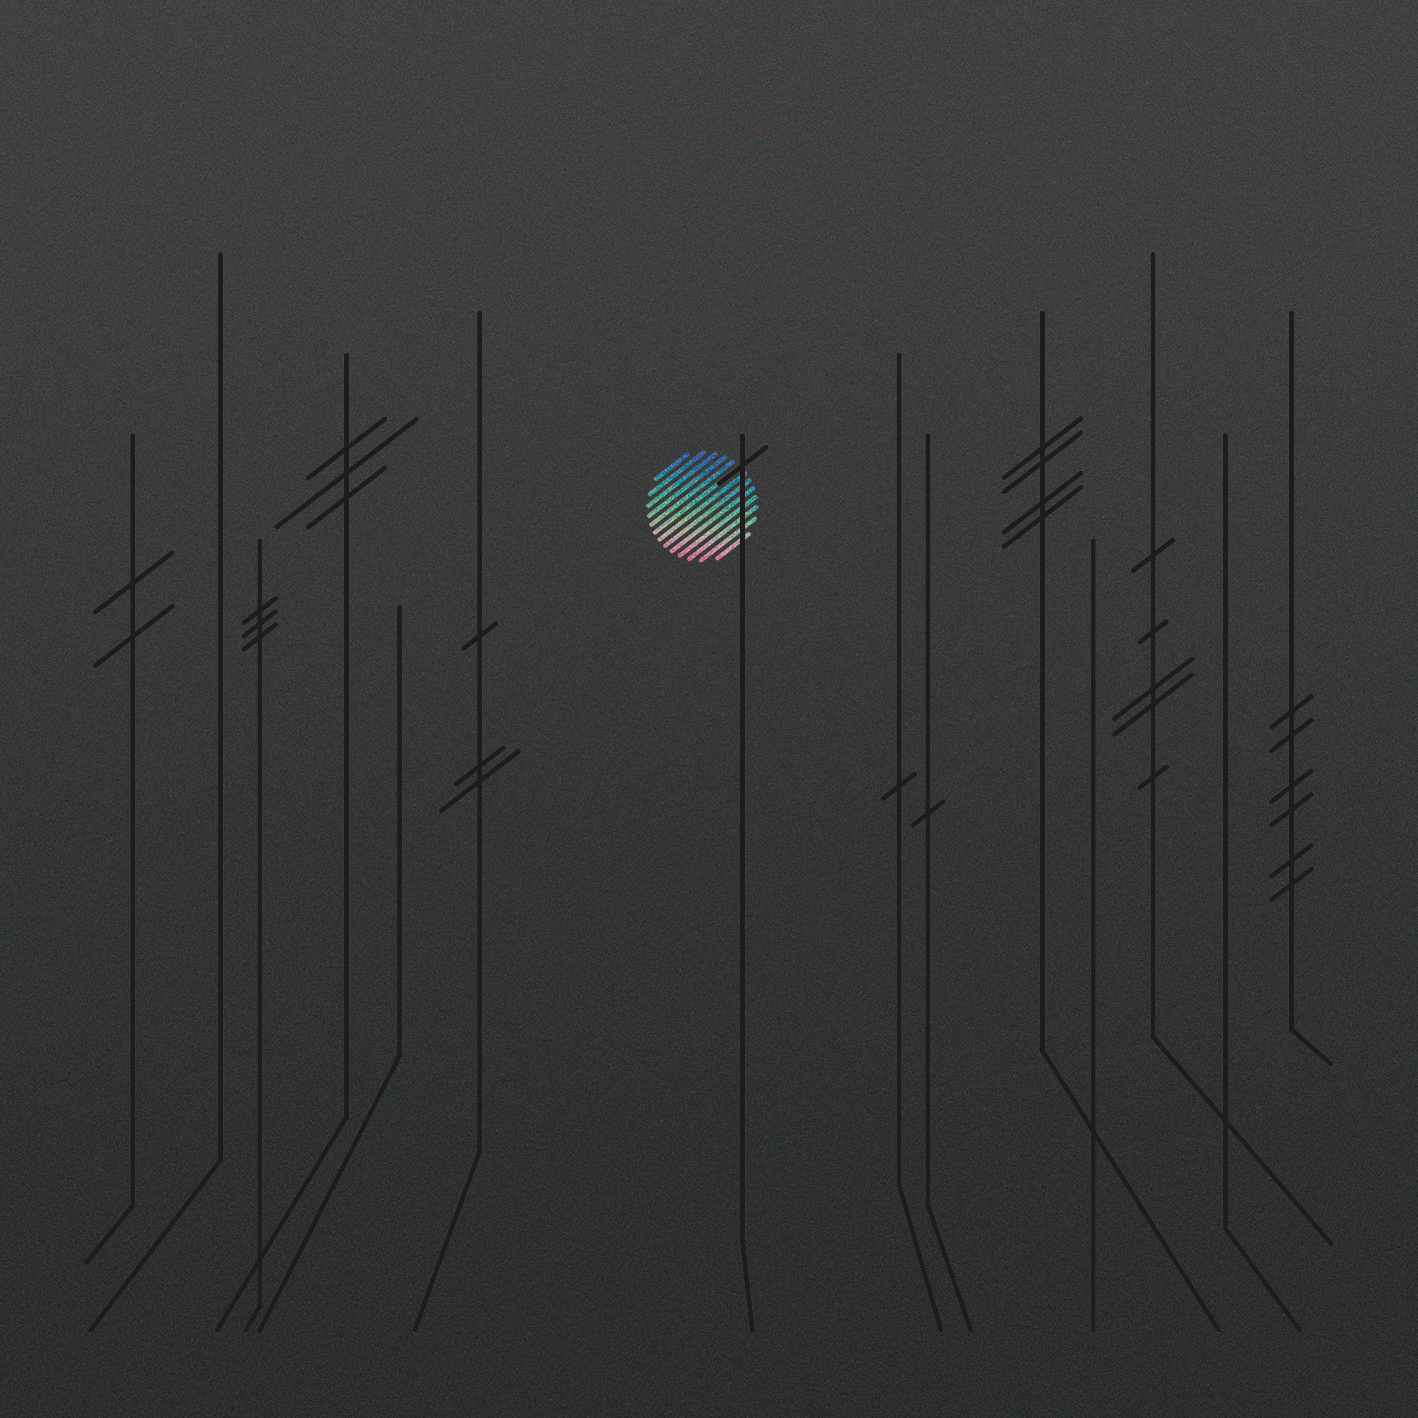 Rabbit-Creation-EP-Cover-Forest-v06